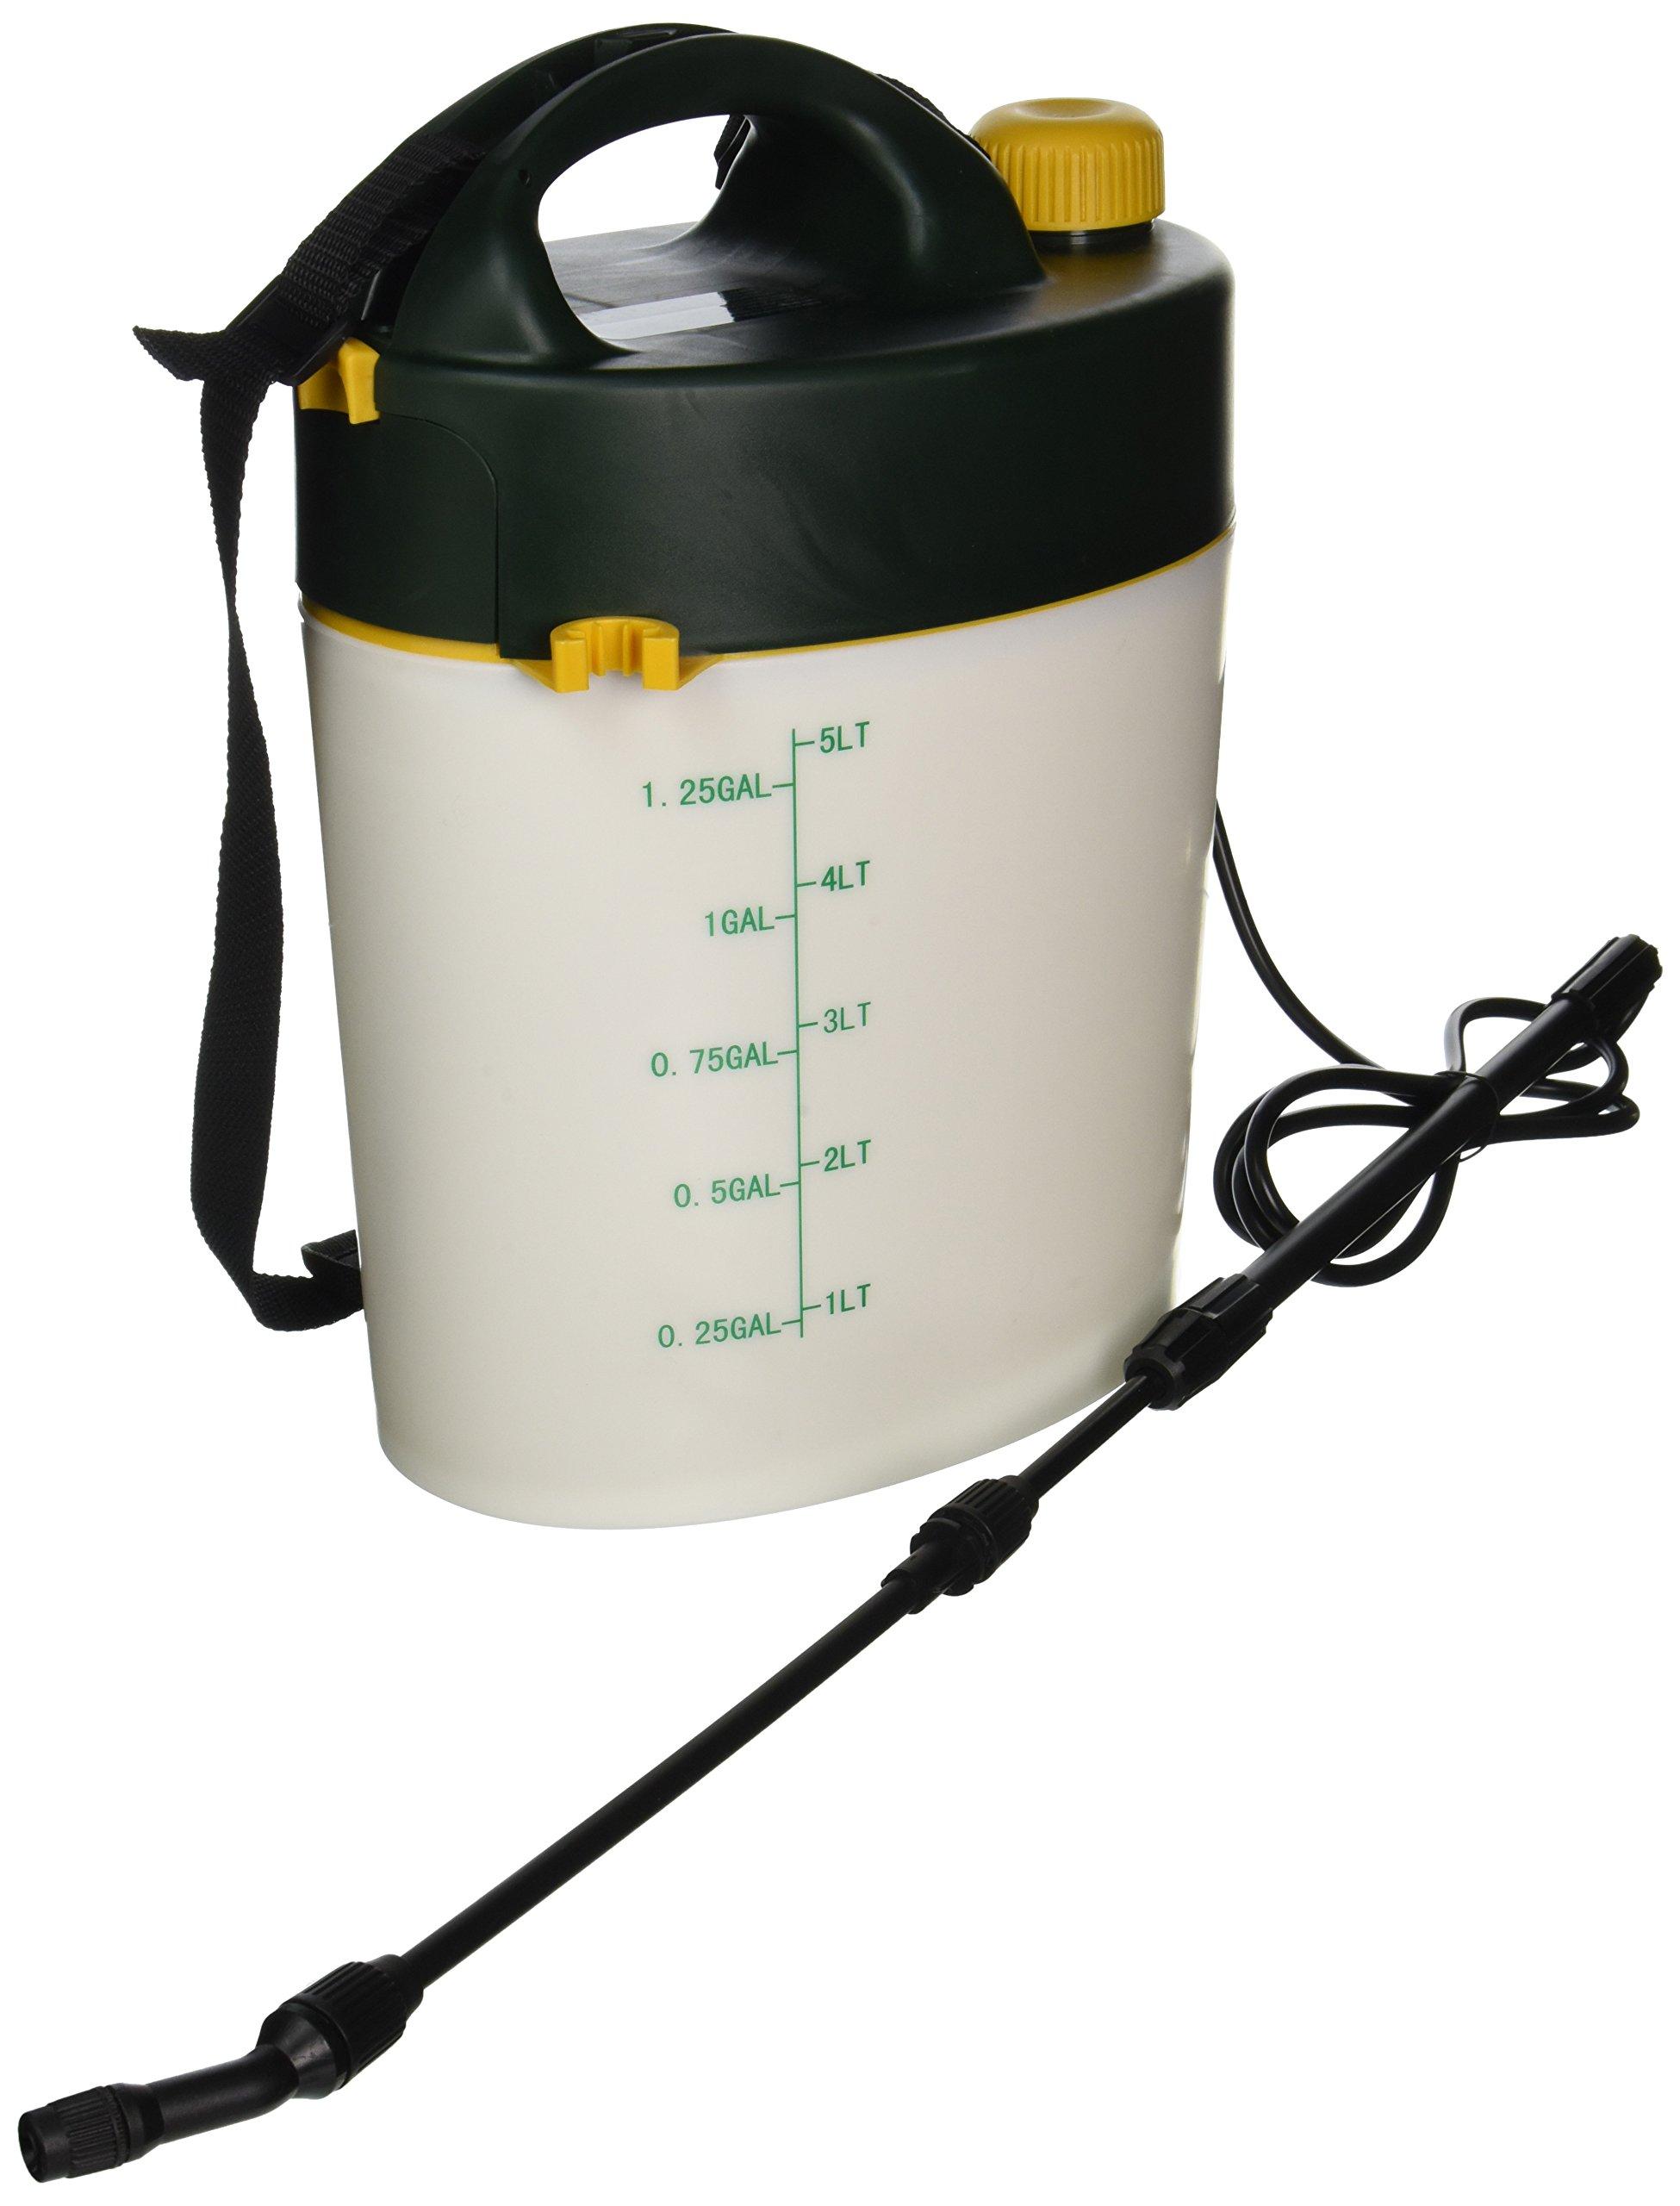 HUDSON 13581 Battery Power Sprayer, 1.3 Gallon by HUDSON